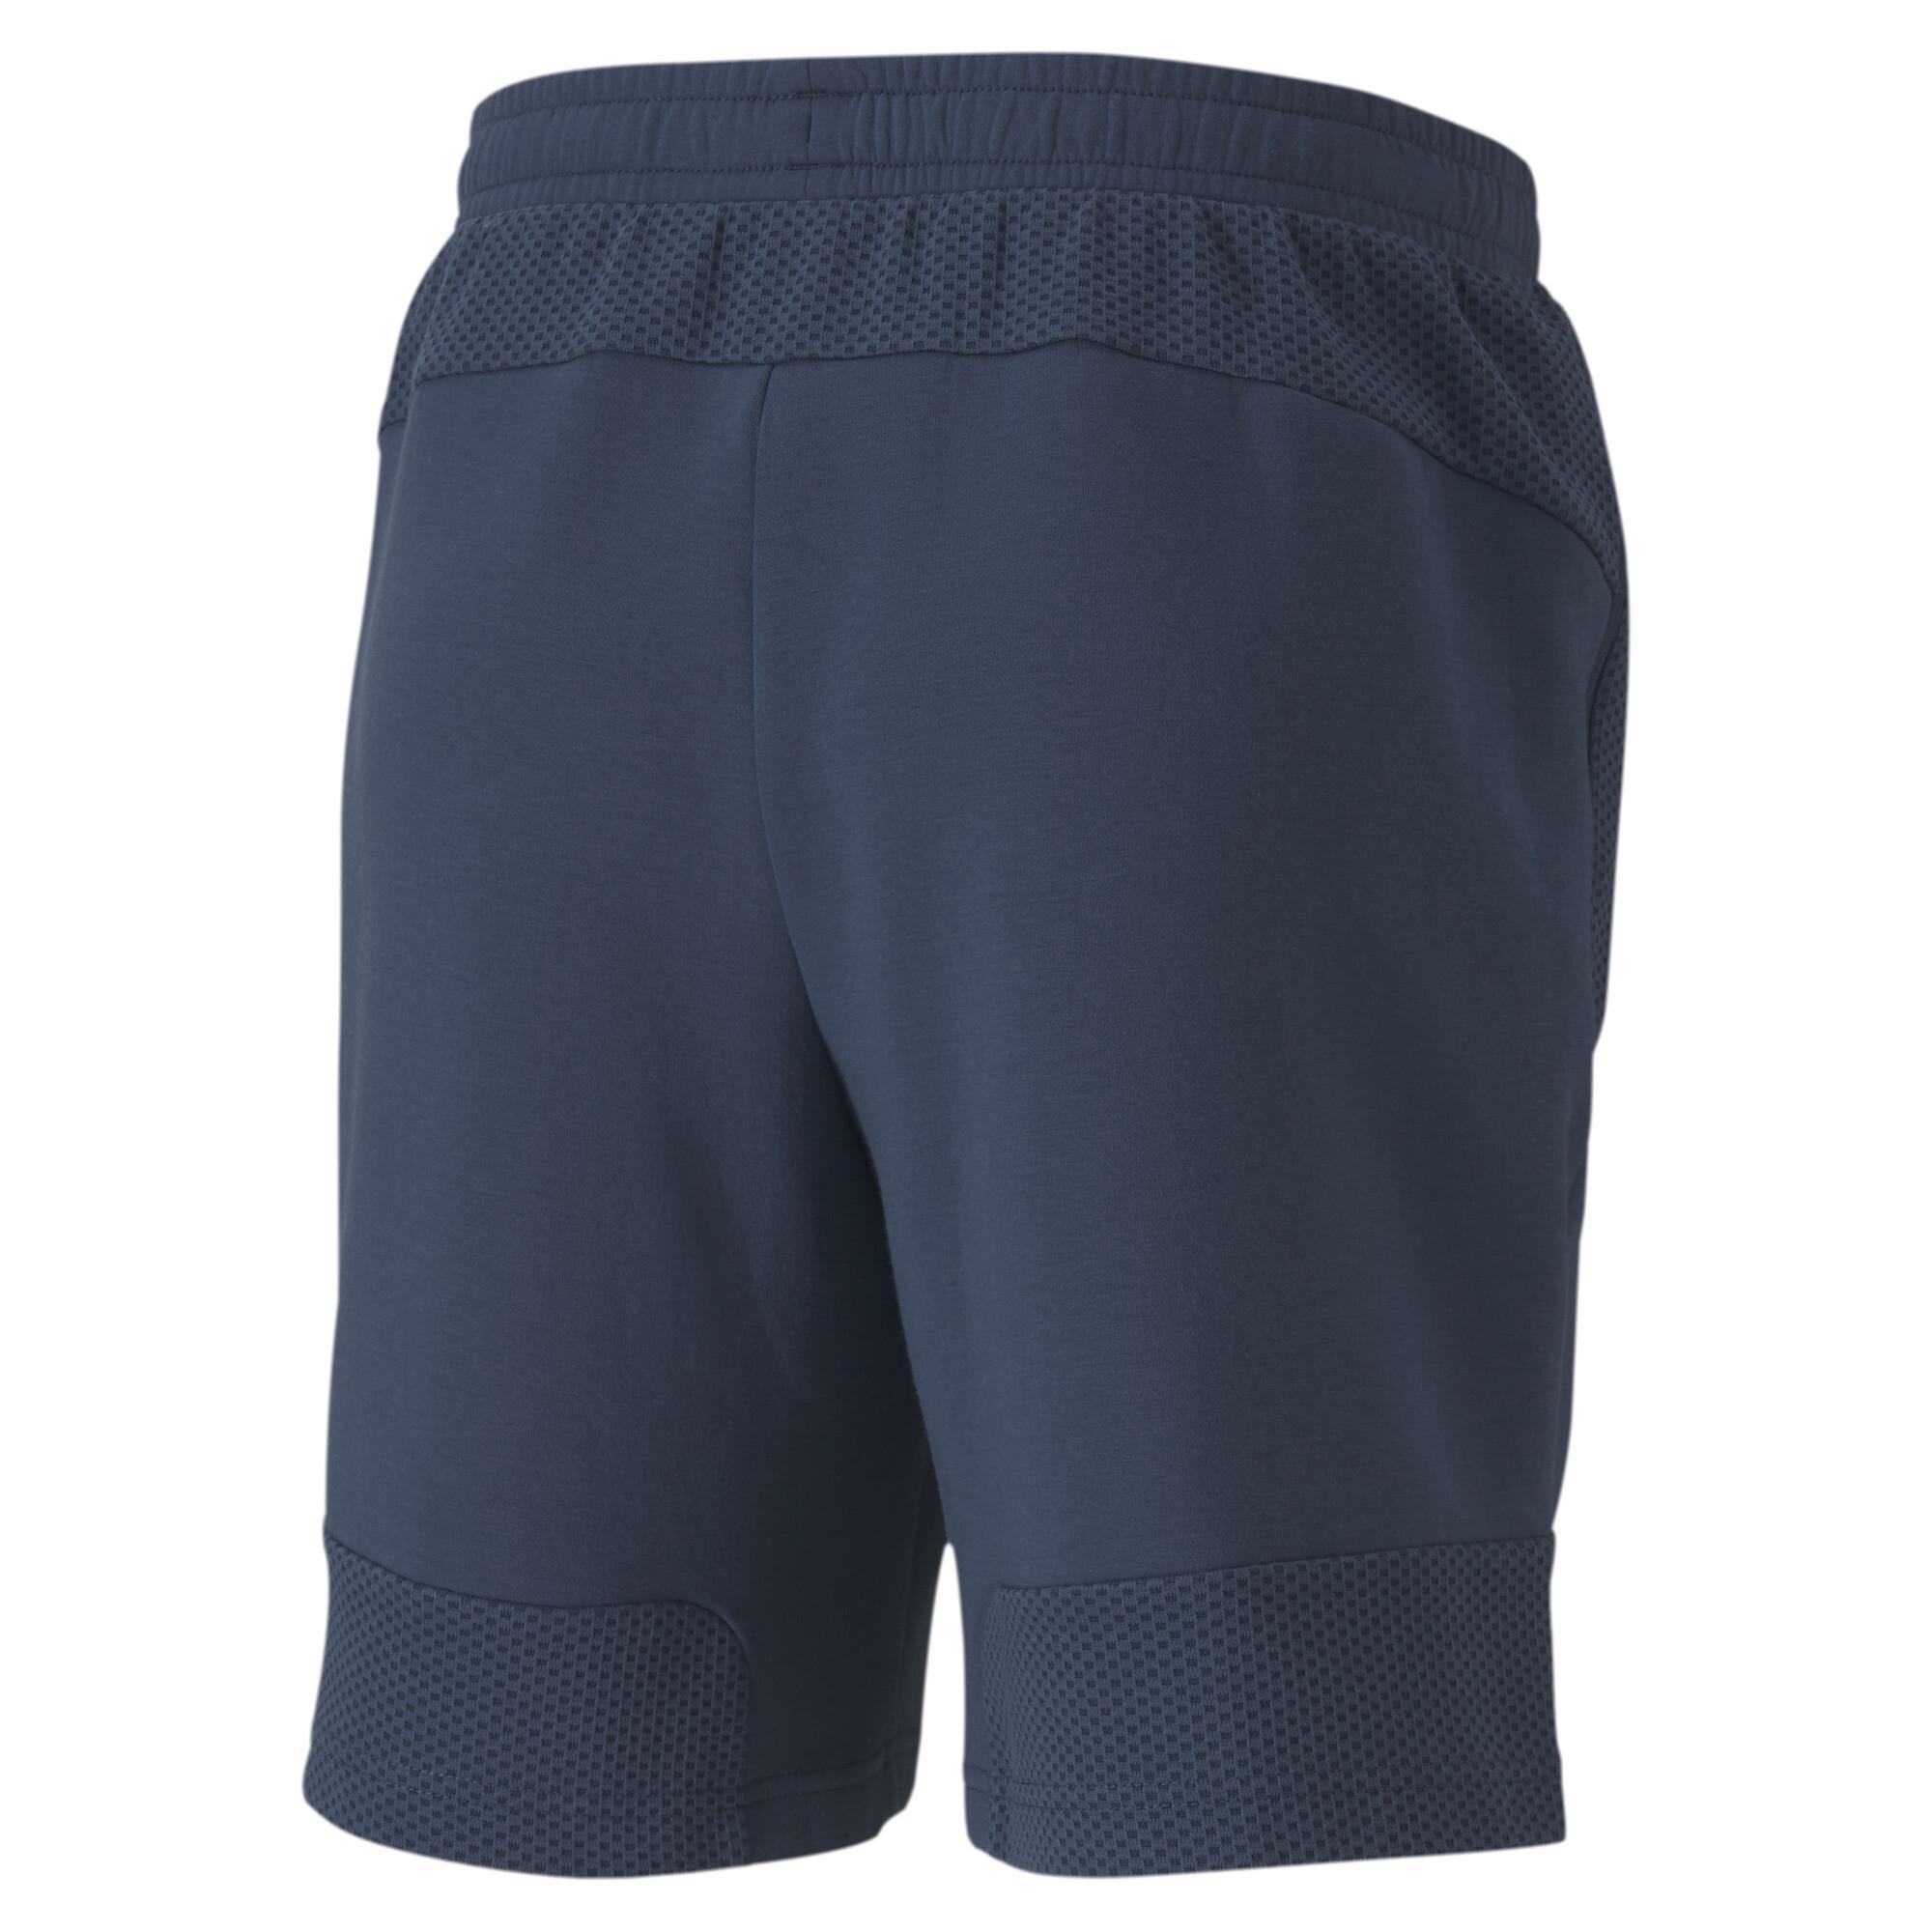 PUMA-Evostripe-Men-039-s-Shorts-Men-Knitted-Shorts-Basics thumbnail 8